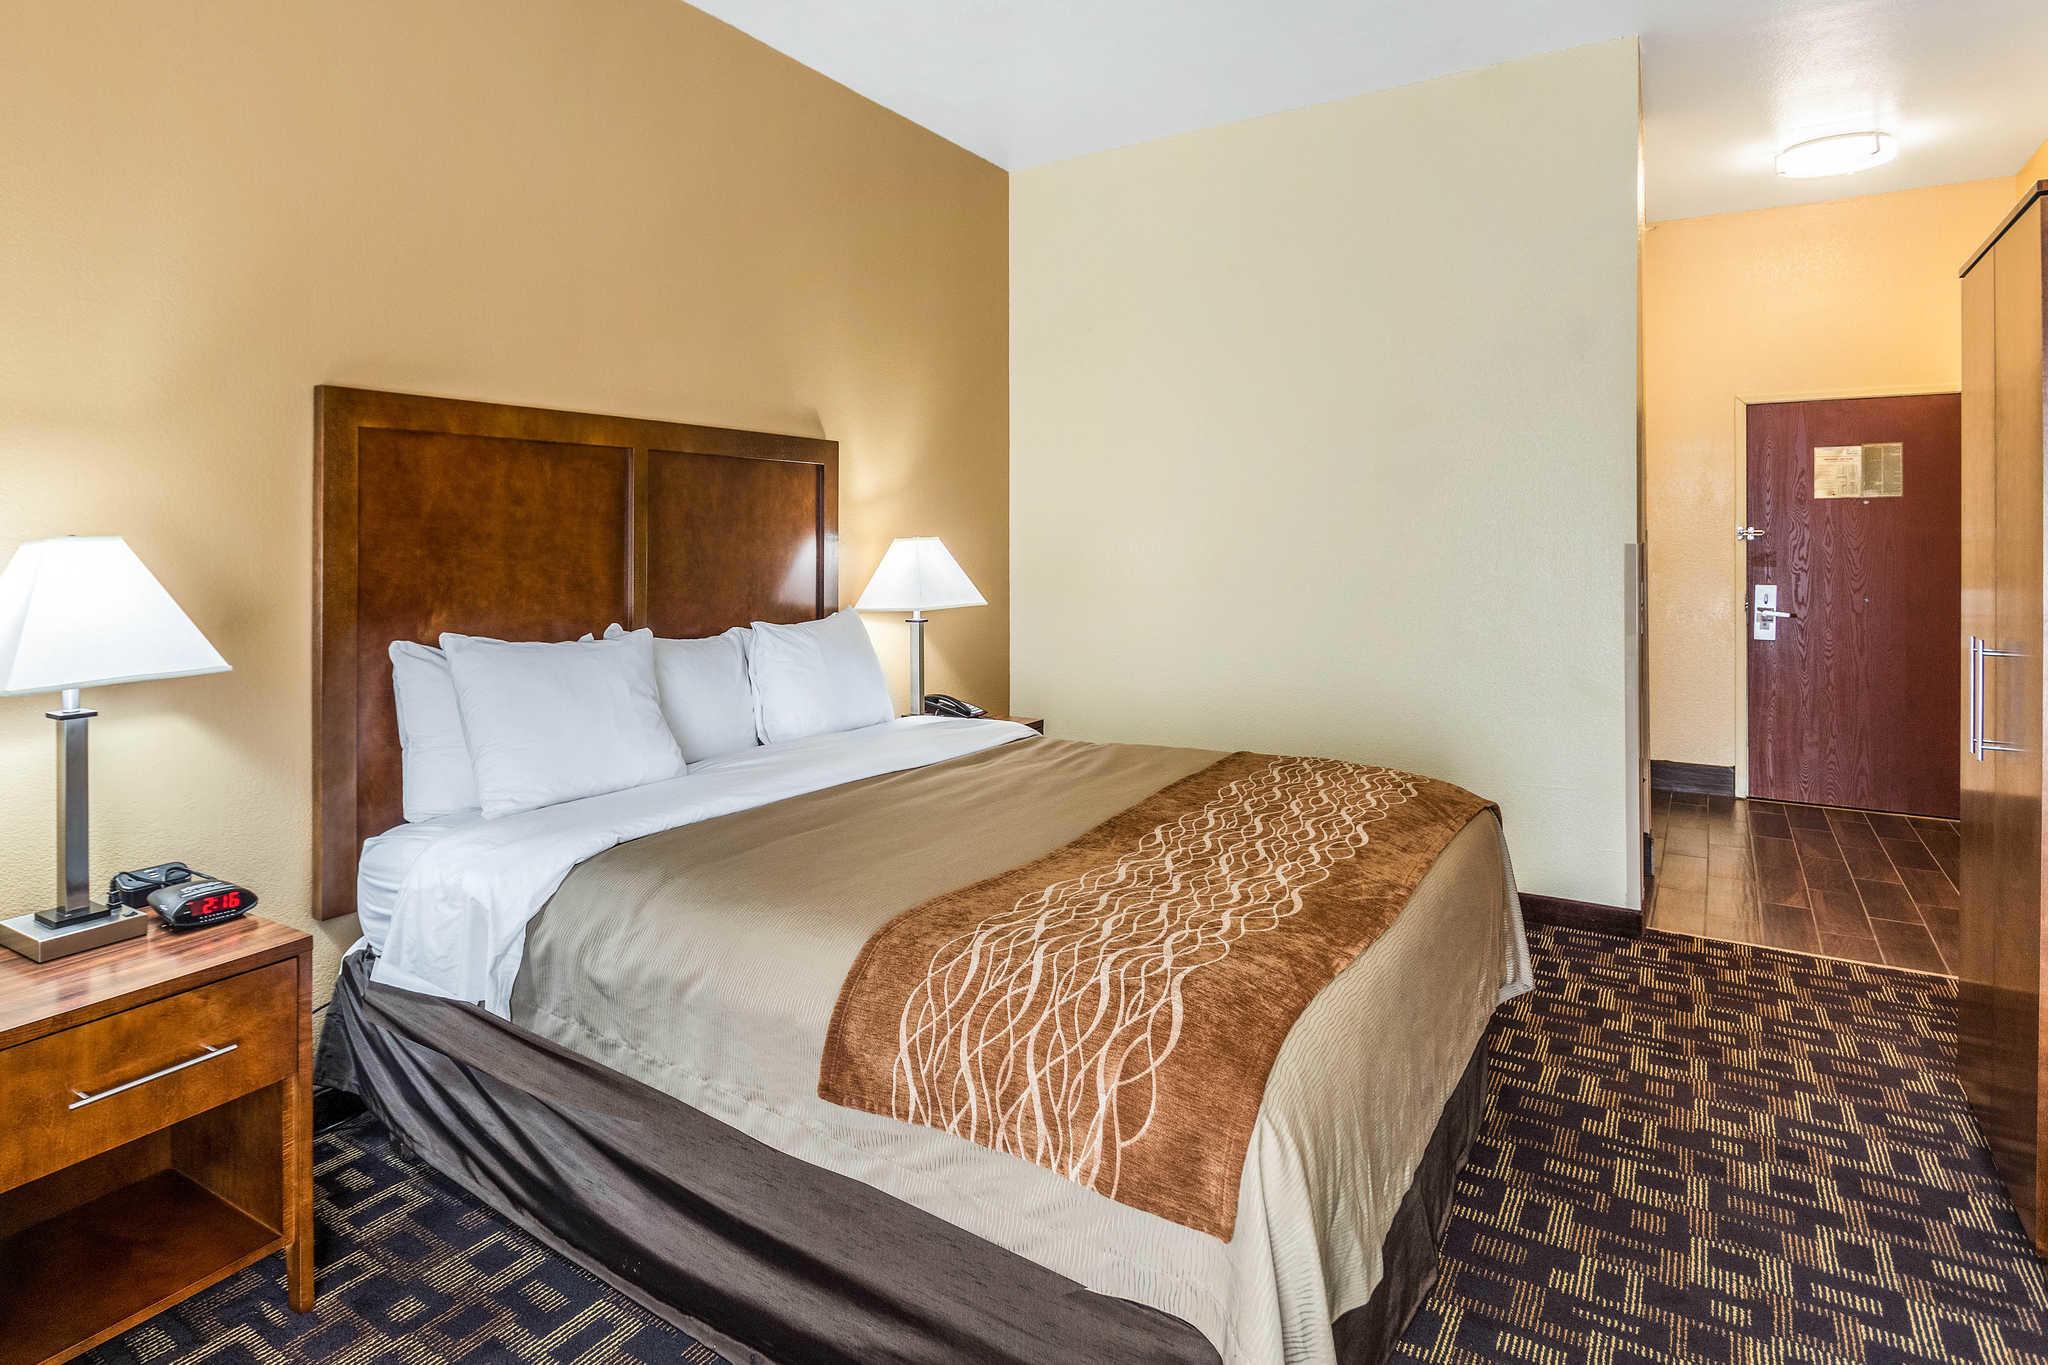 Comfort Inn & Suites North Aurora - Naperville image 10